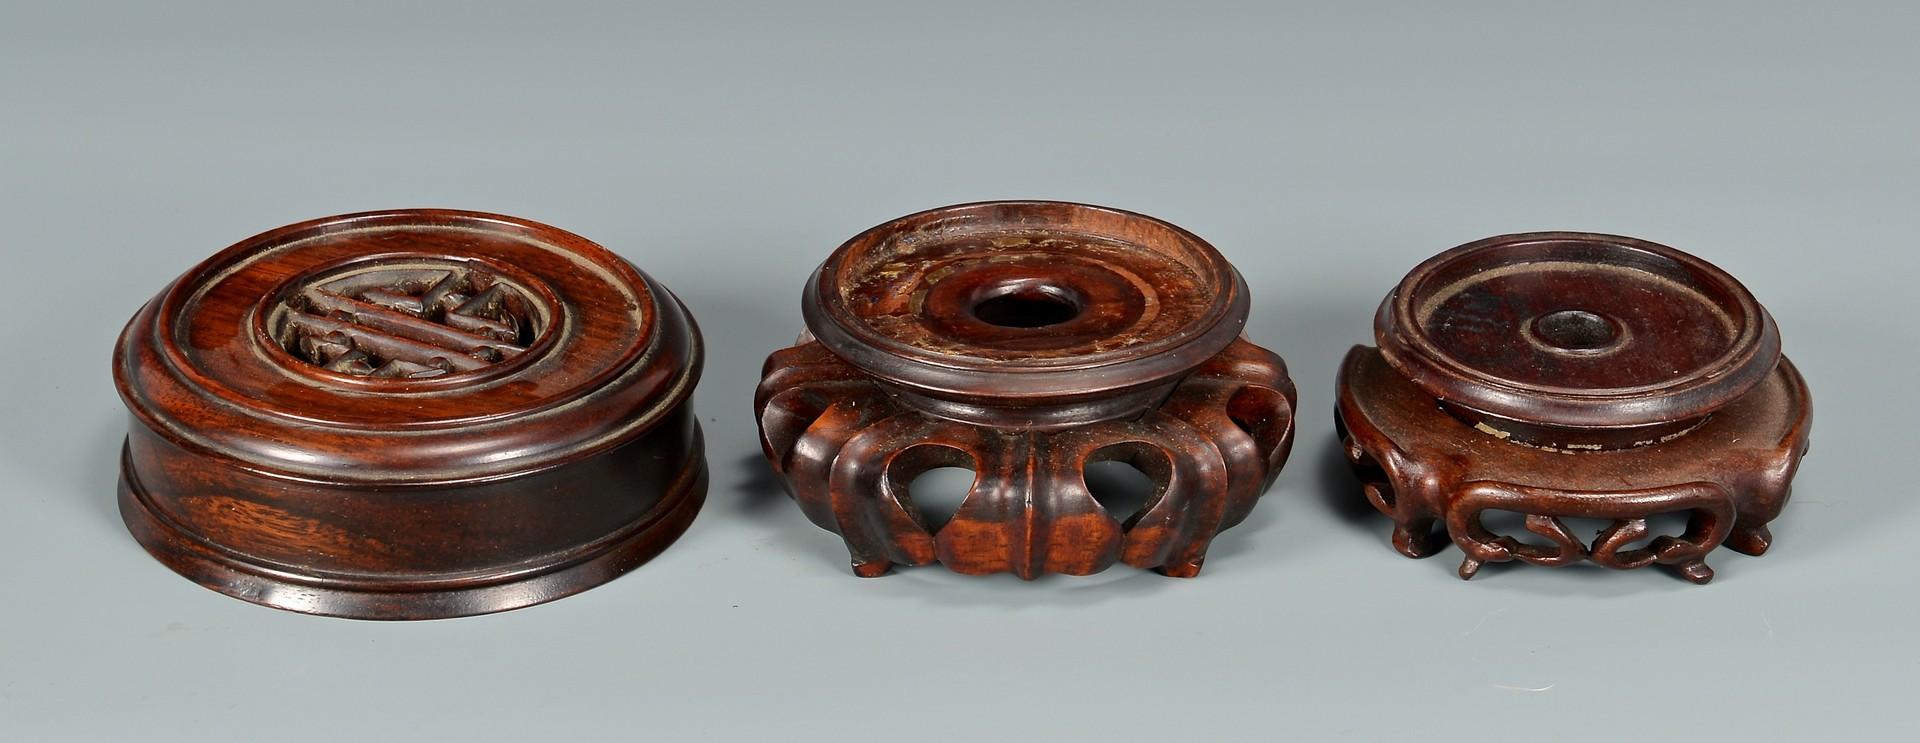 Lot 4010130: 6 Chinese Porcelain Hawthorne Pattern Ginger Jars